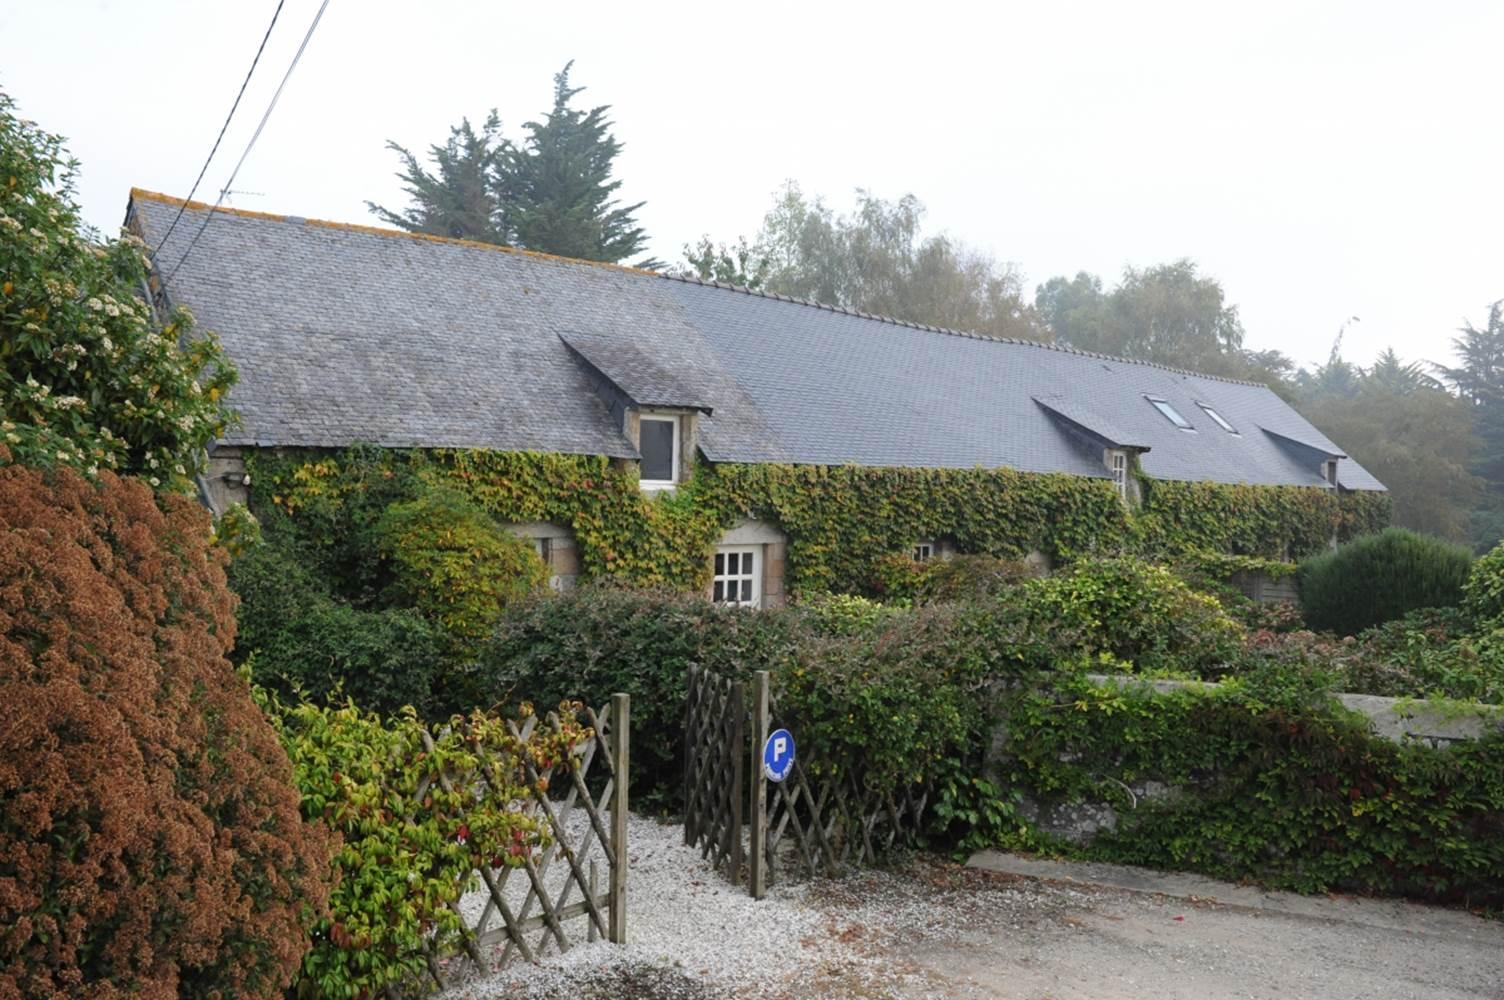 Gîte n°56G1792 – PONT-SCORFF – Morbihan Bretagne Sud © GITES DE France 56